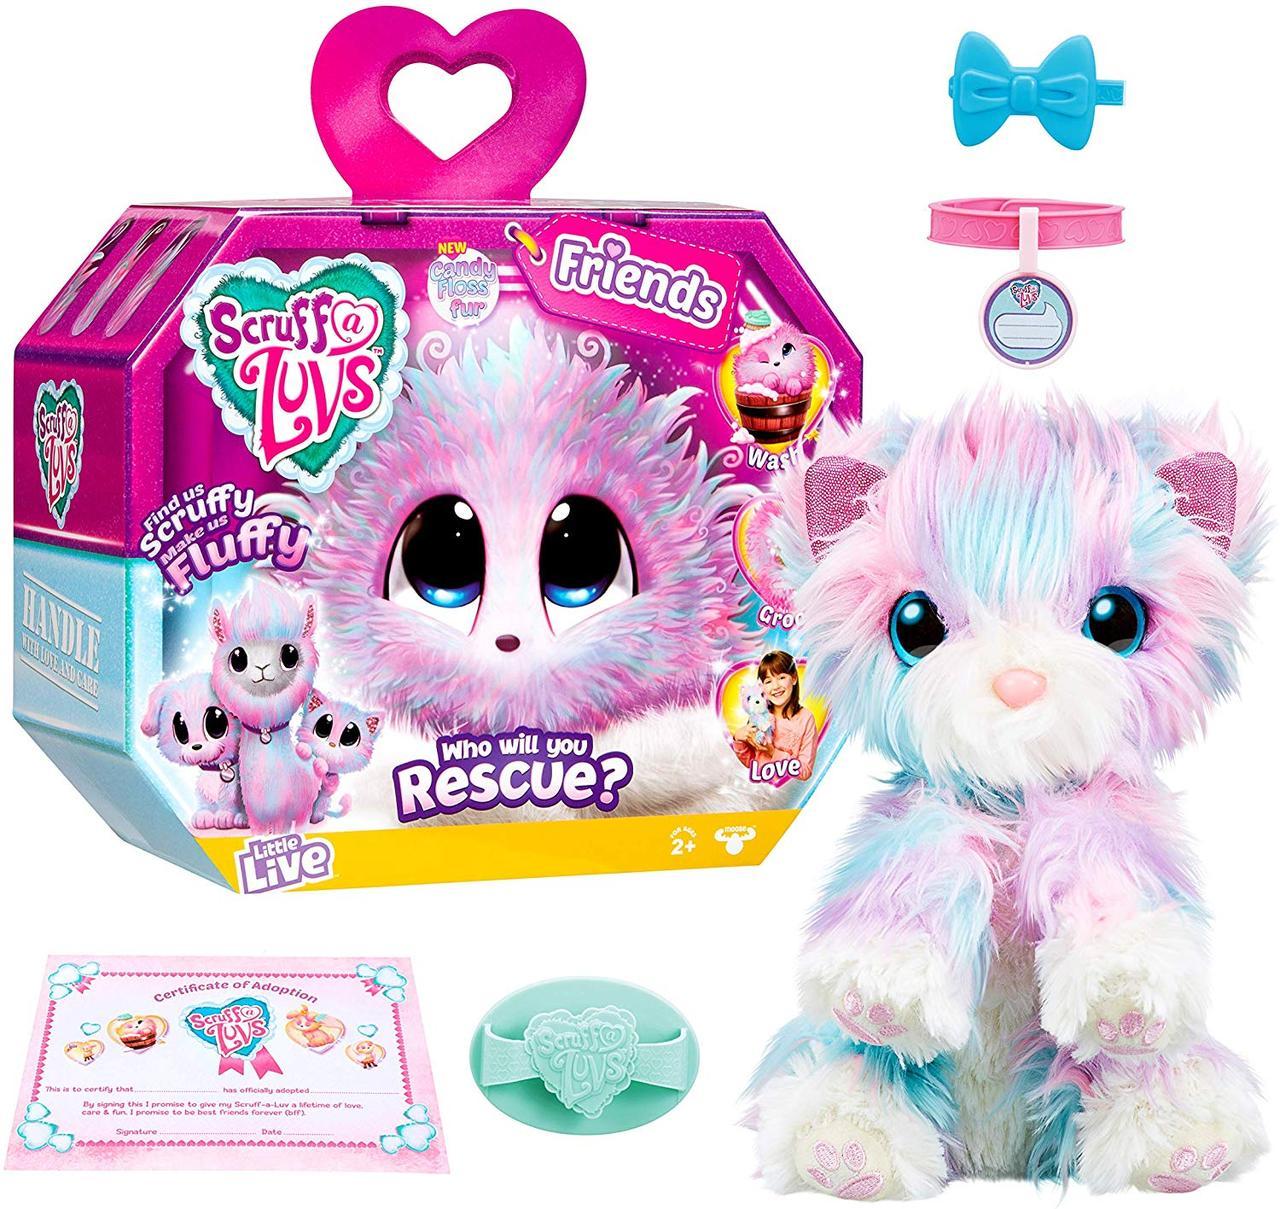 Little Live Питомец сюрприз Няшка Потеряшка меланж Little Live Scruff A Luvs Rescue Pet Candy Floss